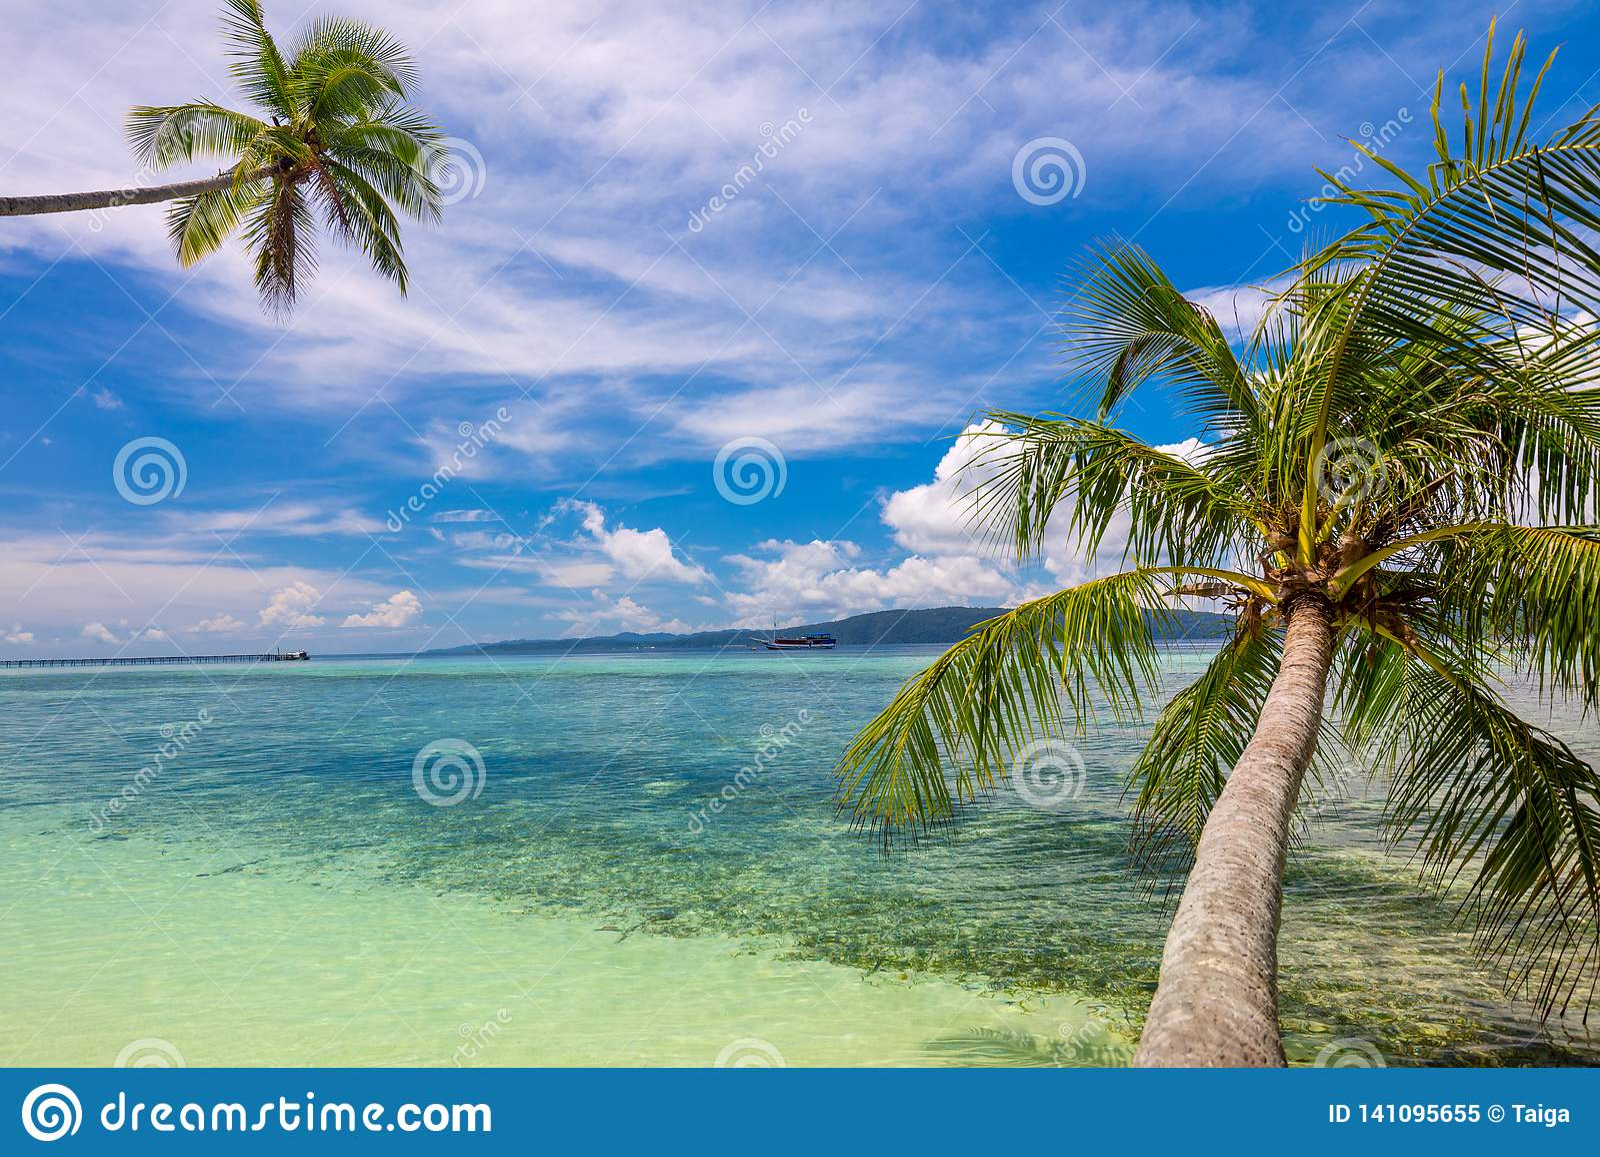 Fundo tropical da praia - ressaca do mar calmo, palmeiras e céu azul